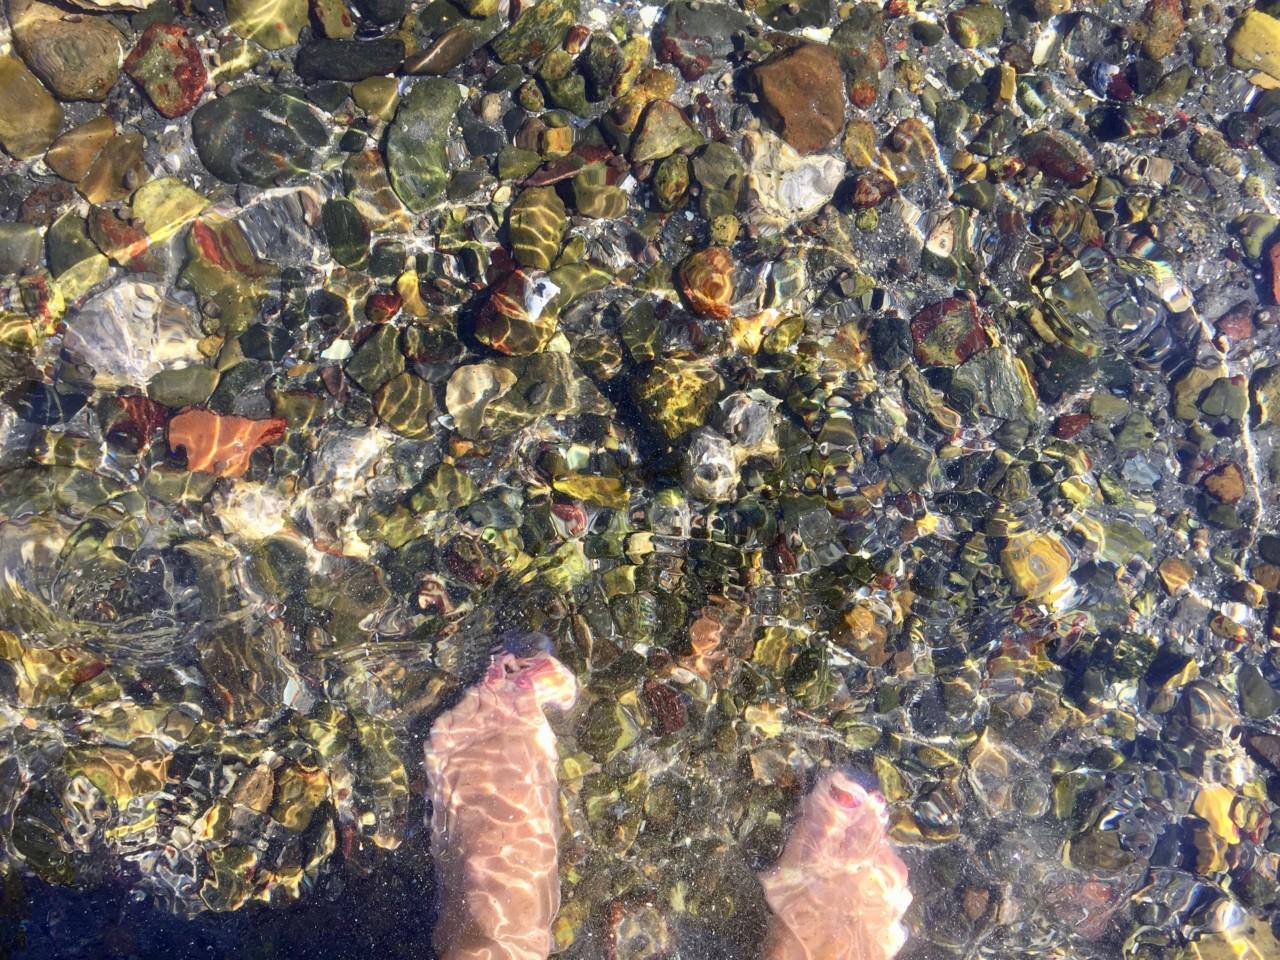 anja-stang-badesko-hav-osters-oysters-nesodden